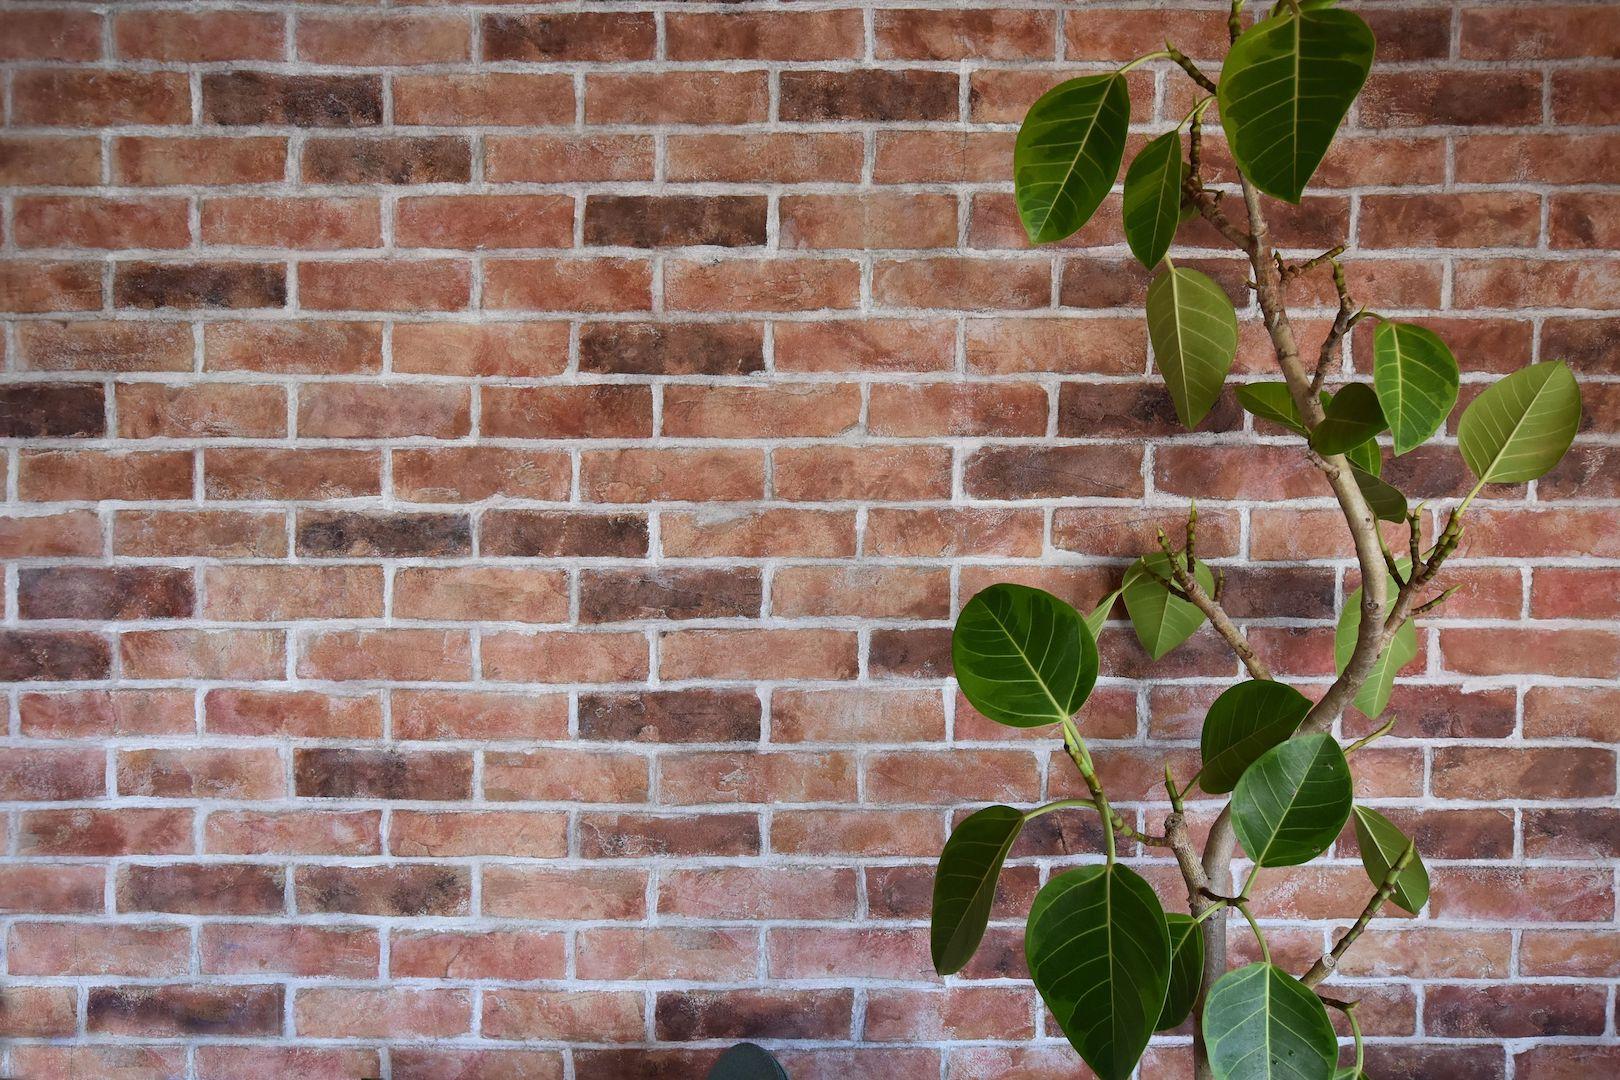 vol37. デザインコンクリート、どんな風に施工する?